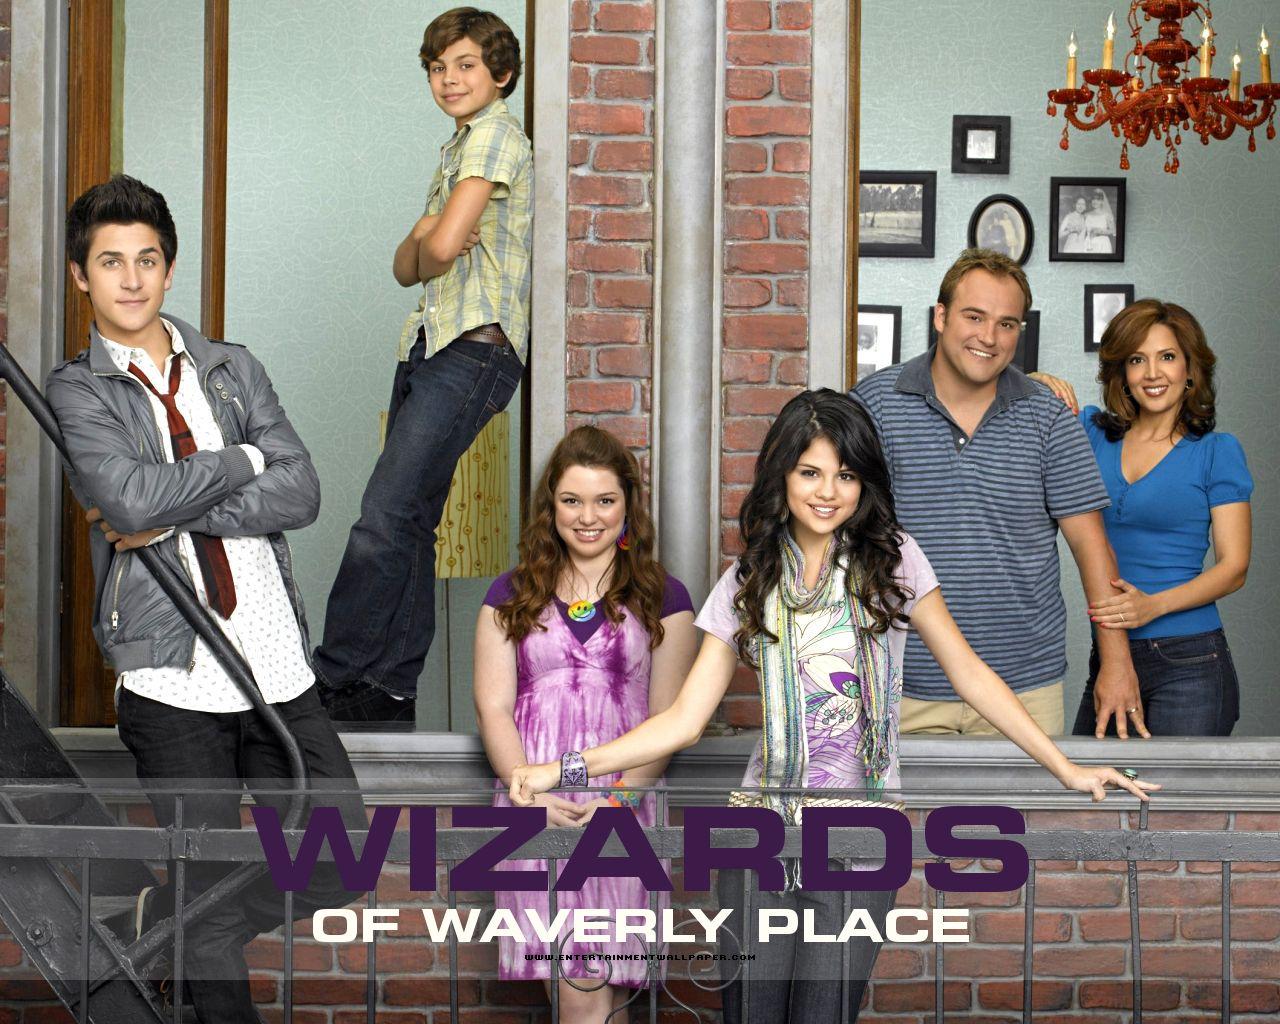 Wizards Of Waverly Place Vs Hannah Montana Afeabb9c20b9eb85bc0f2de309118ea1